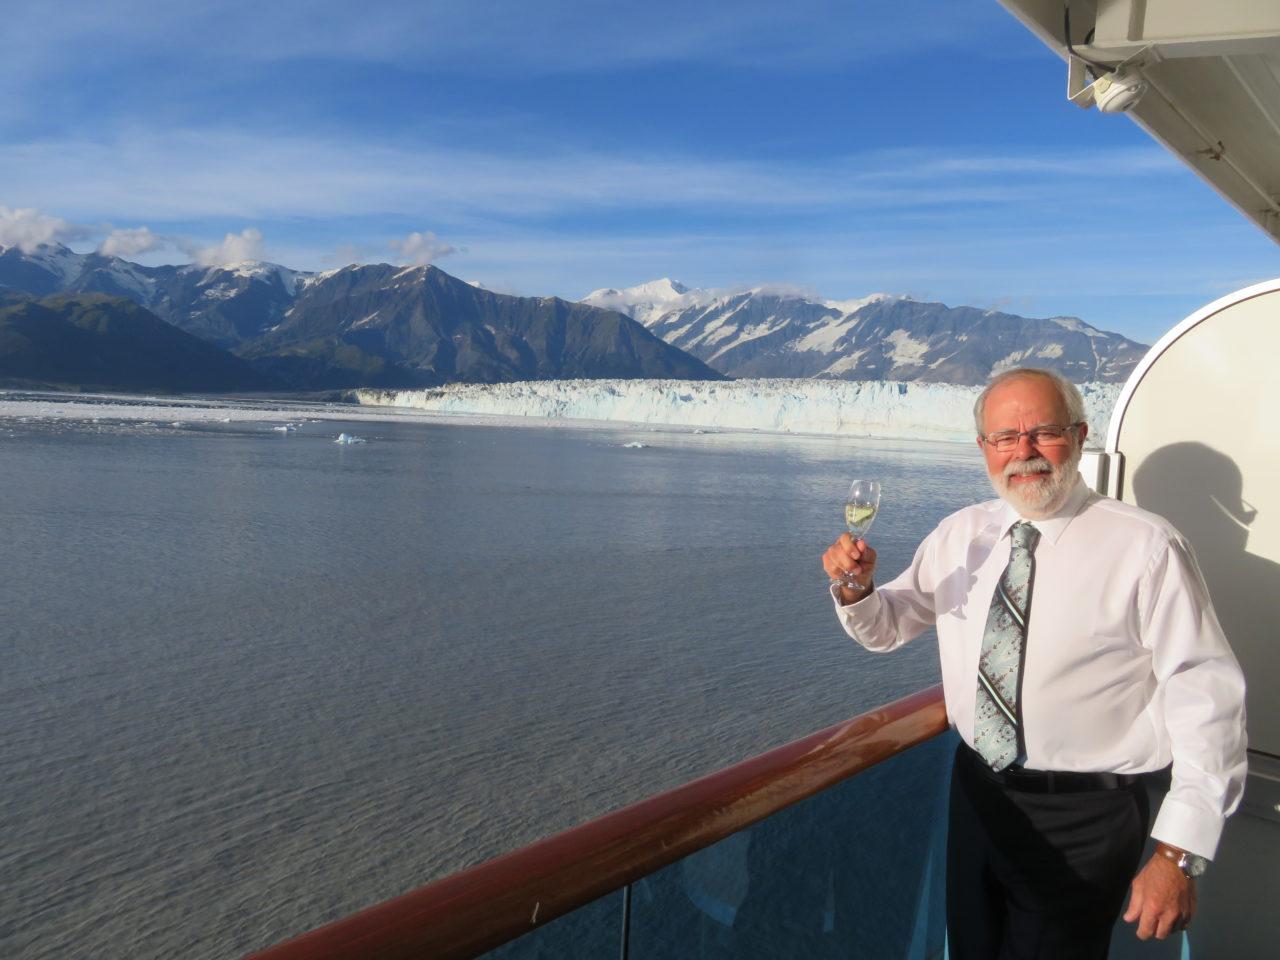 Louis-Simon at Hubbard Glacier